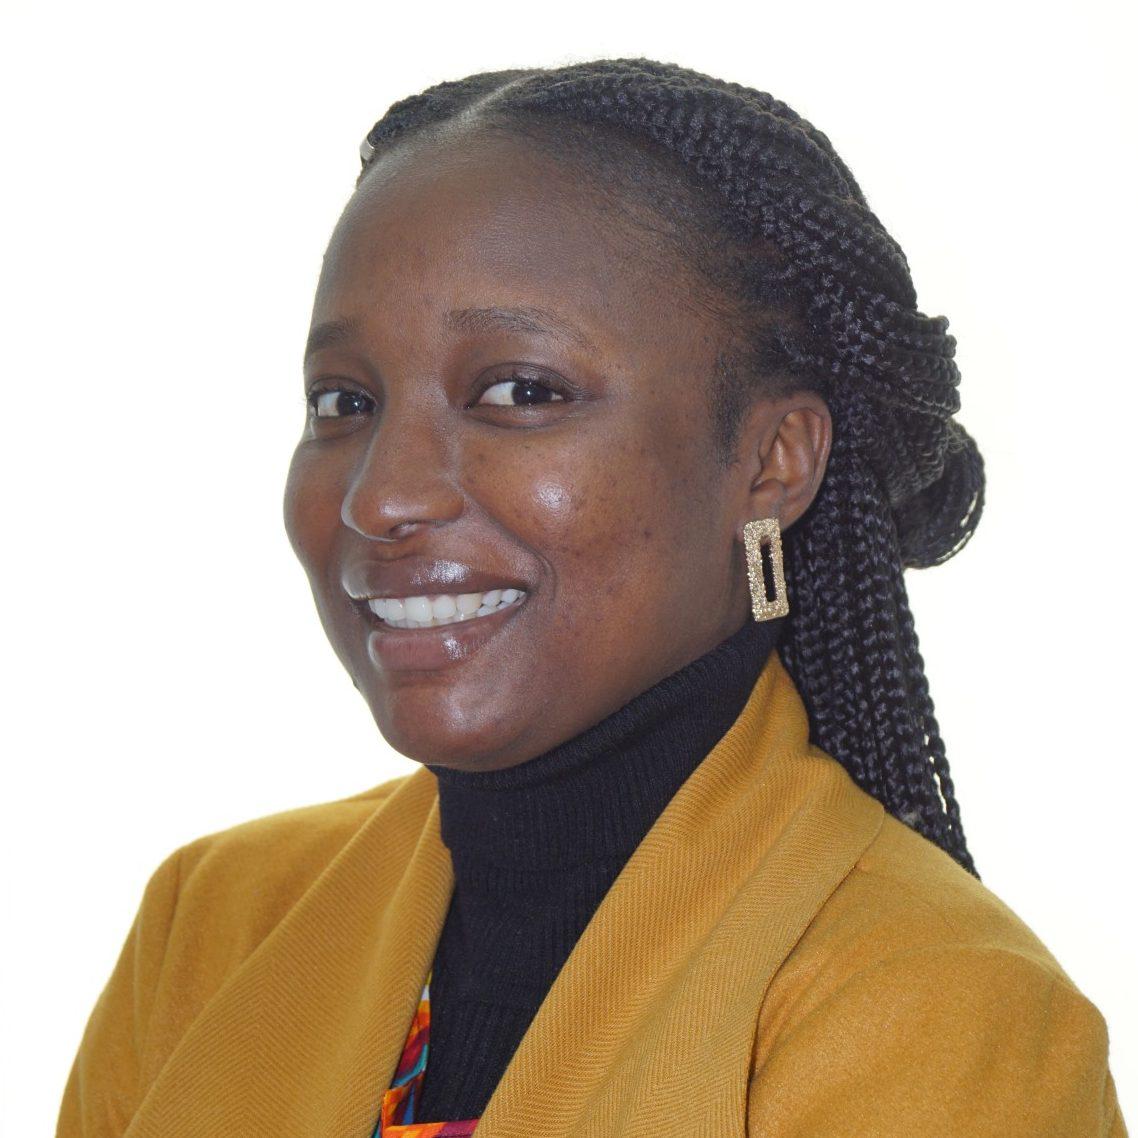 Headshot of Joy-Carew Isatu